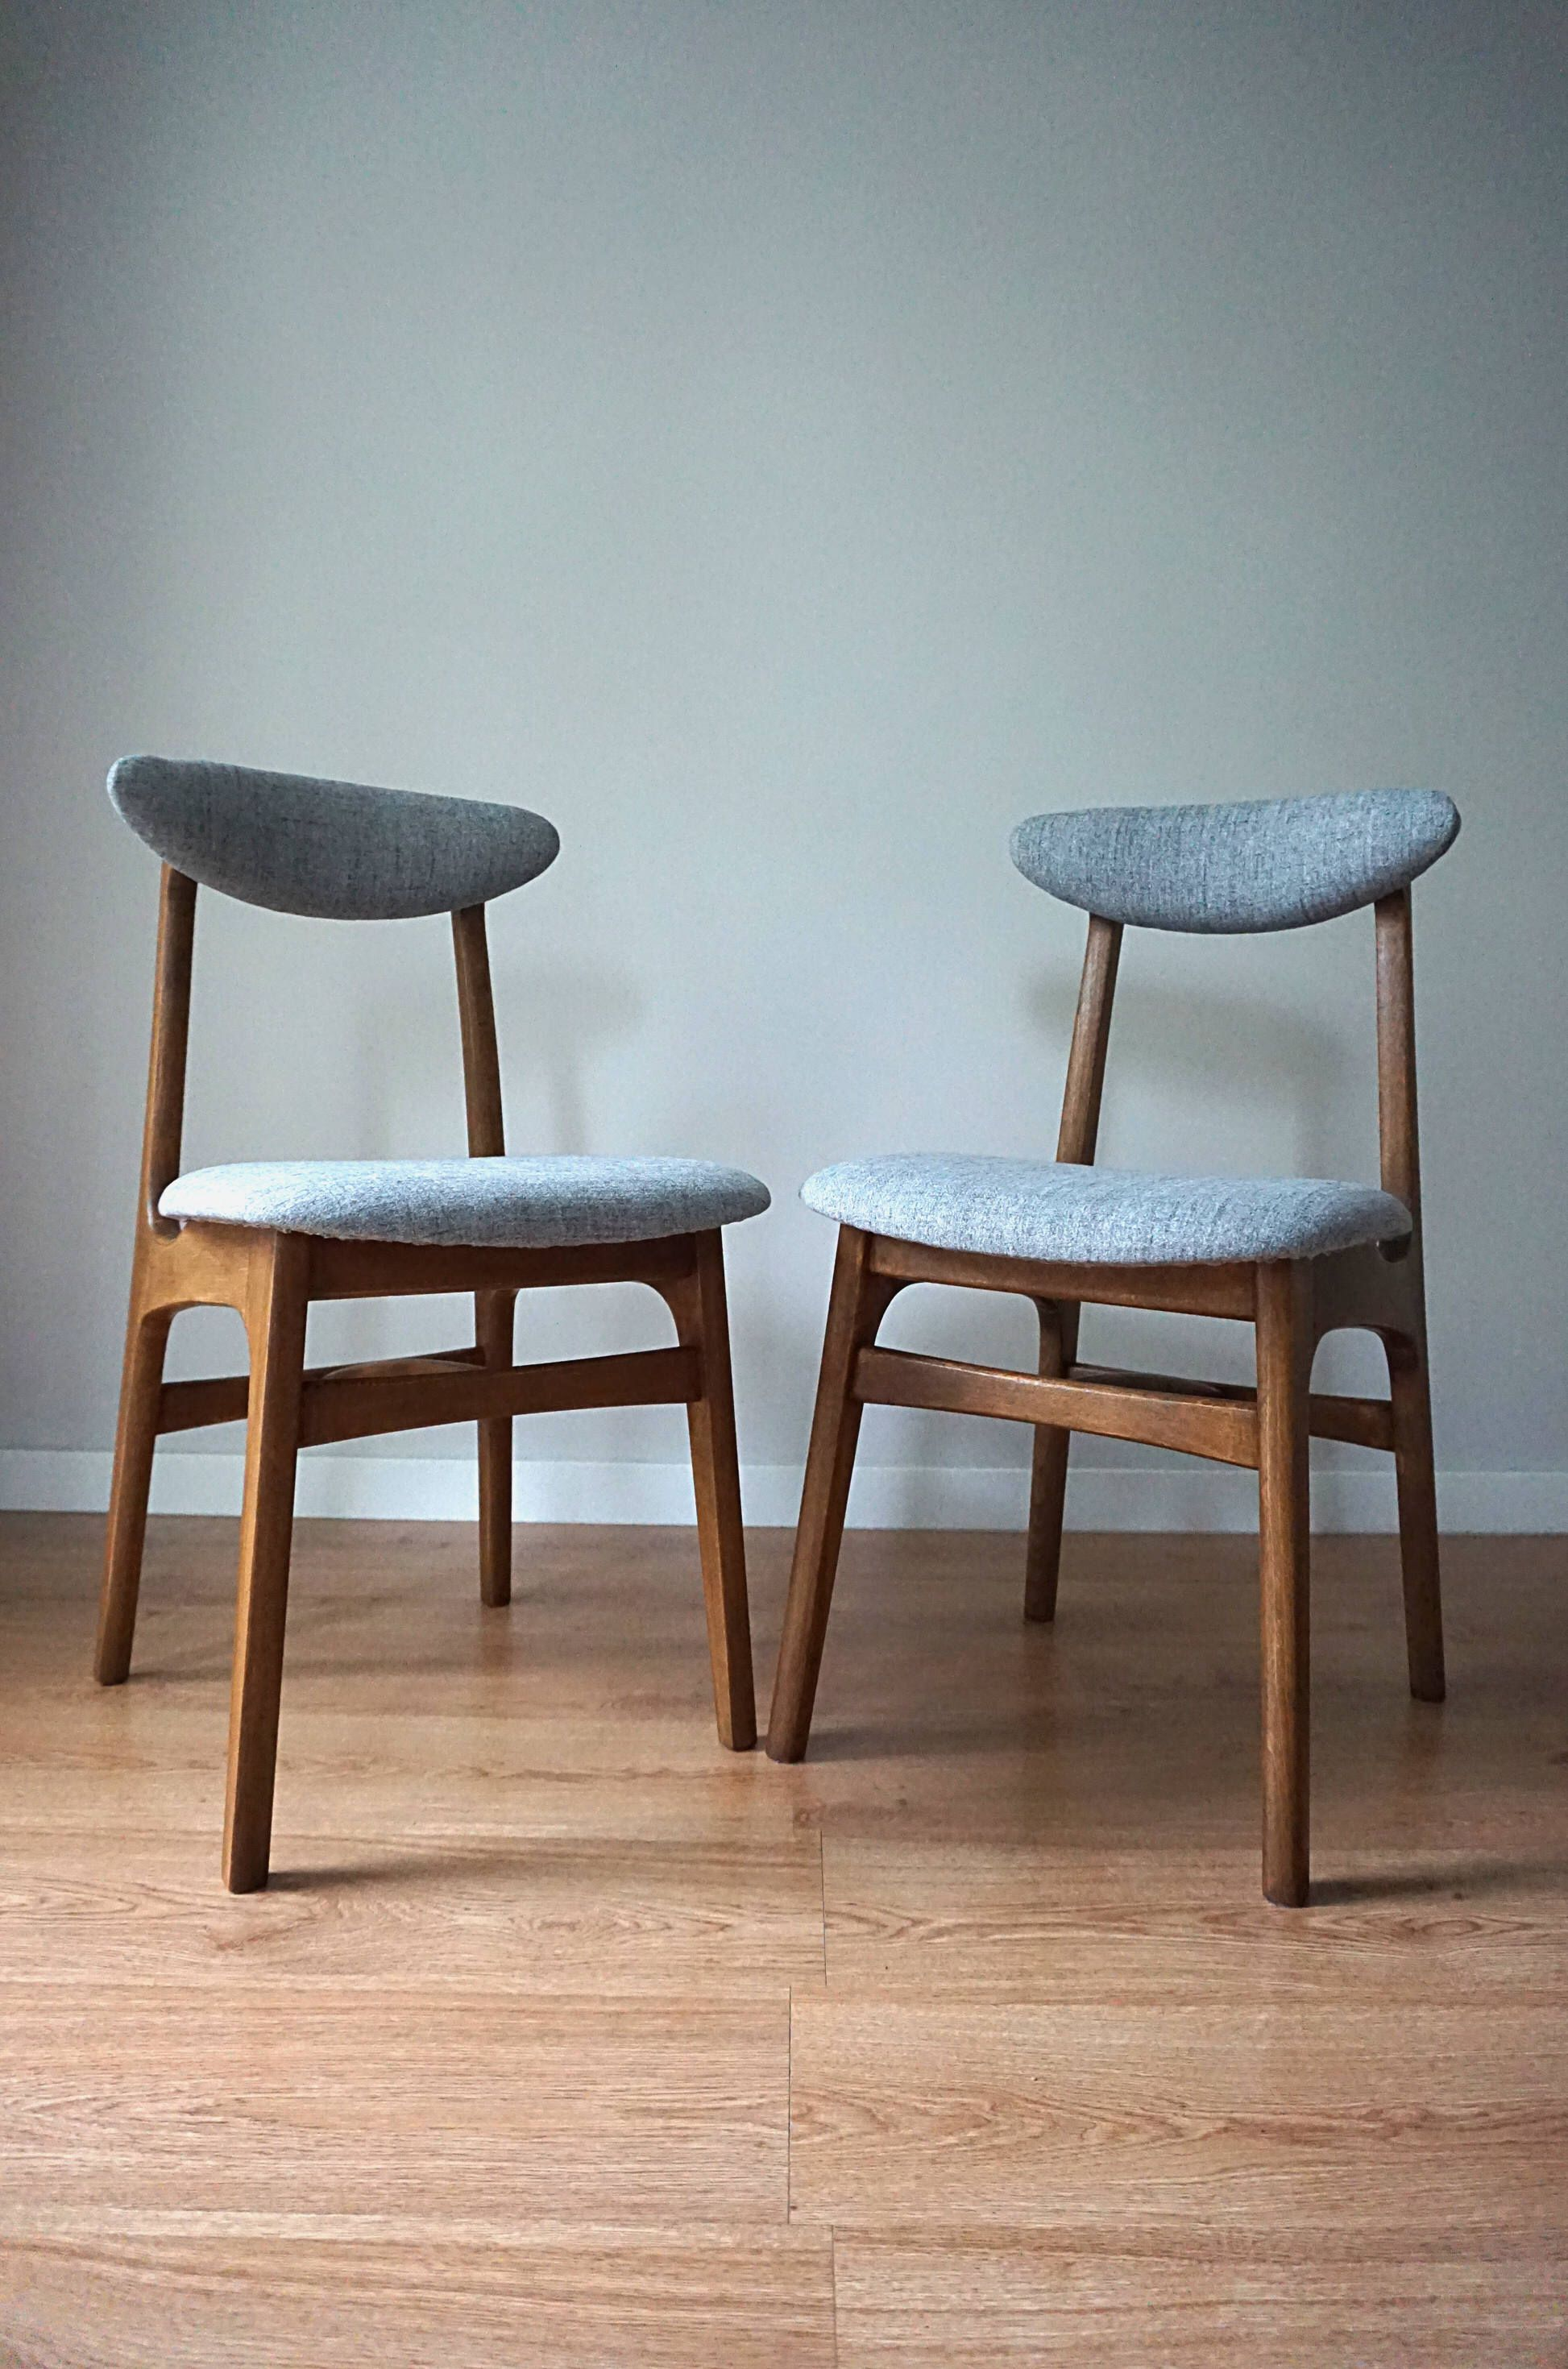 Pair Of Rare Vintage Mid Century Danish Modern 60s Chairs Retro